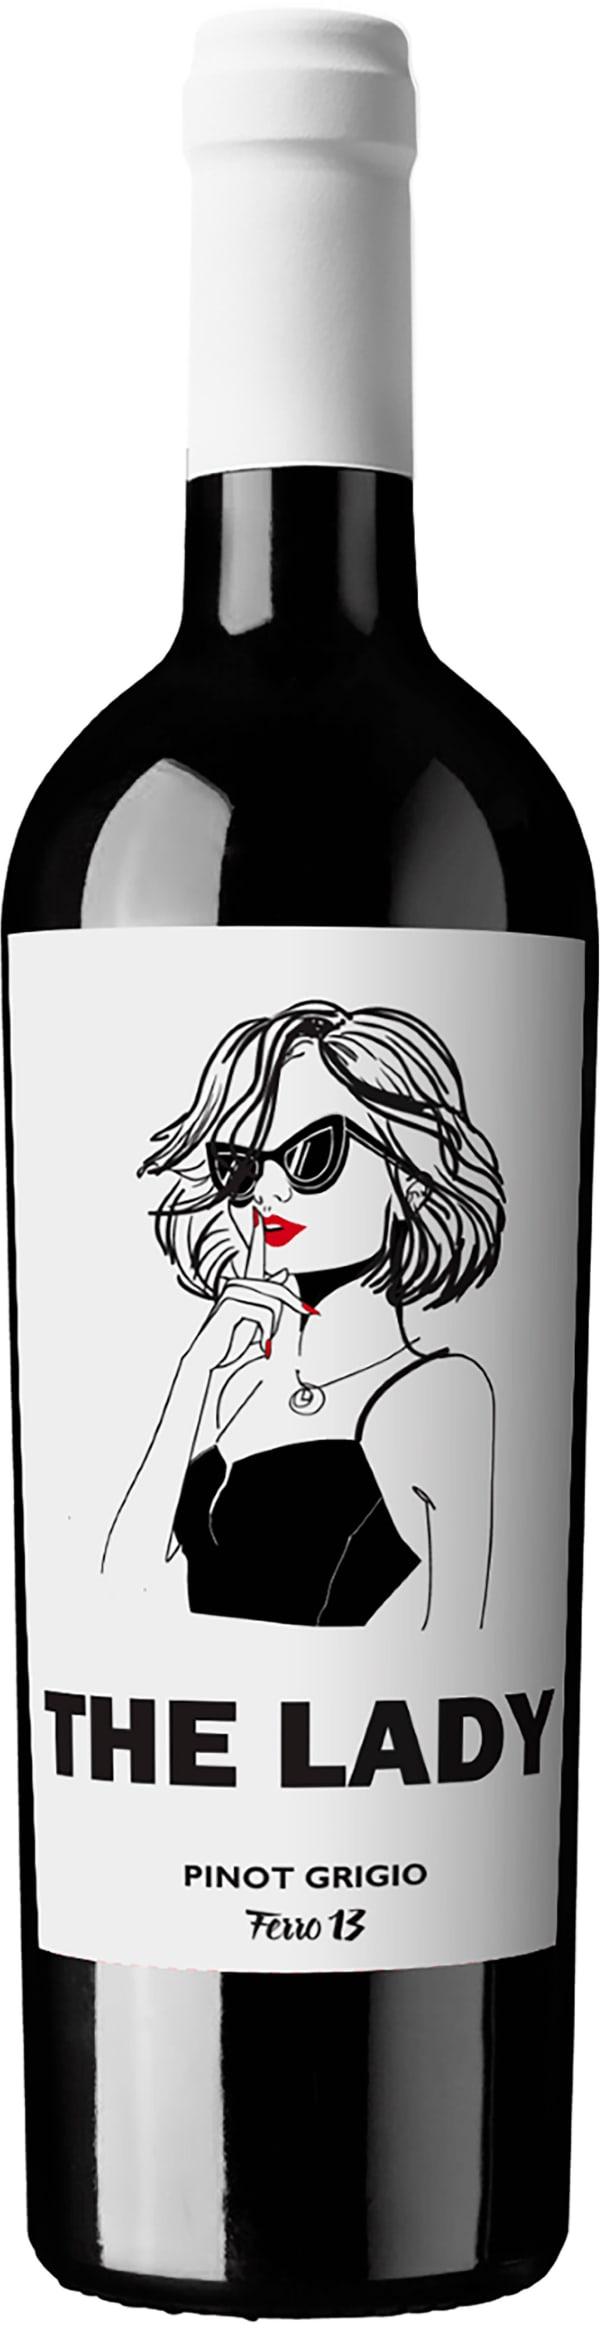 The Lady Pinot Grigio 2019